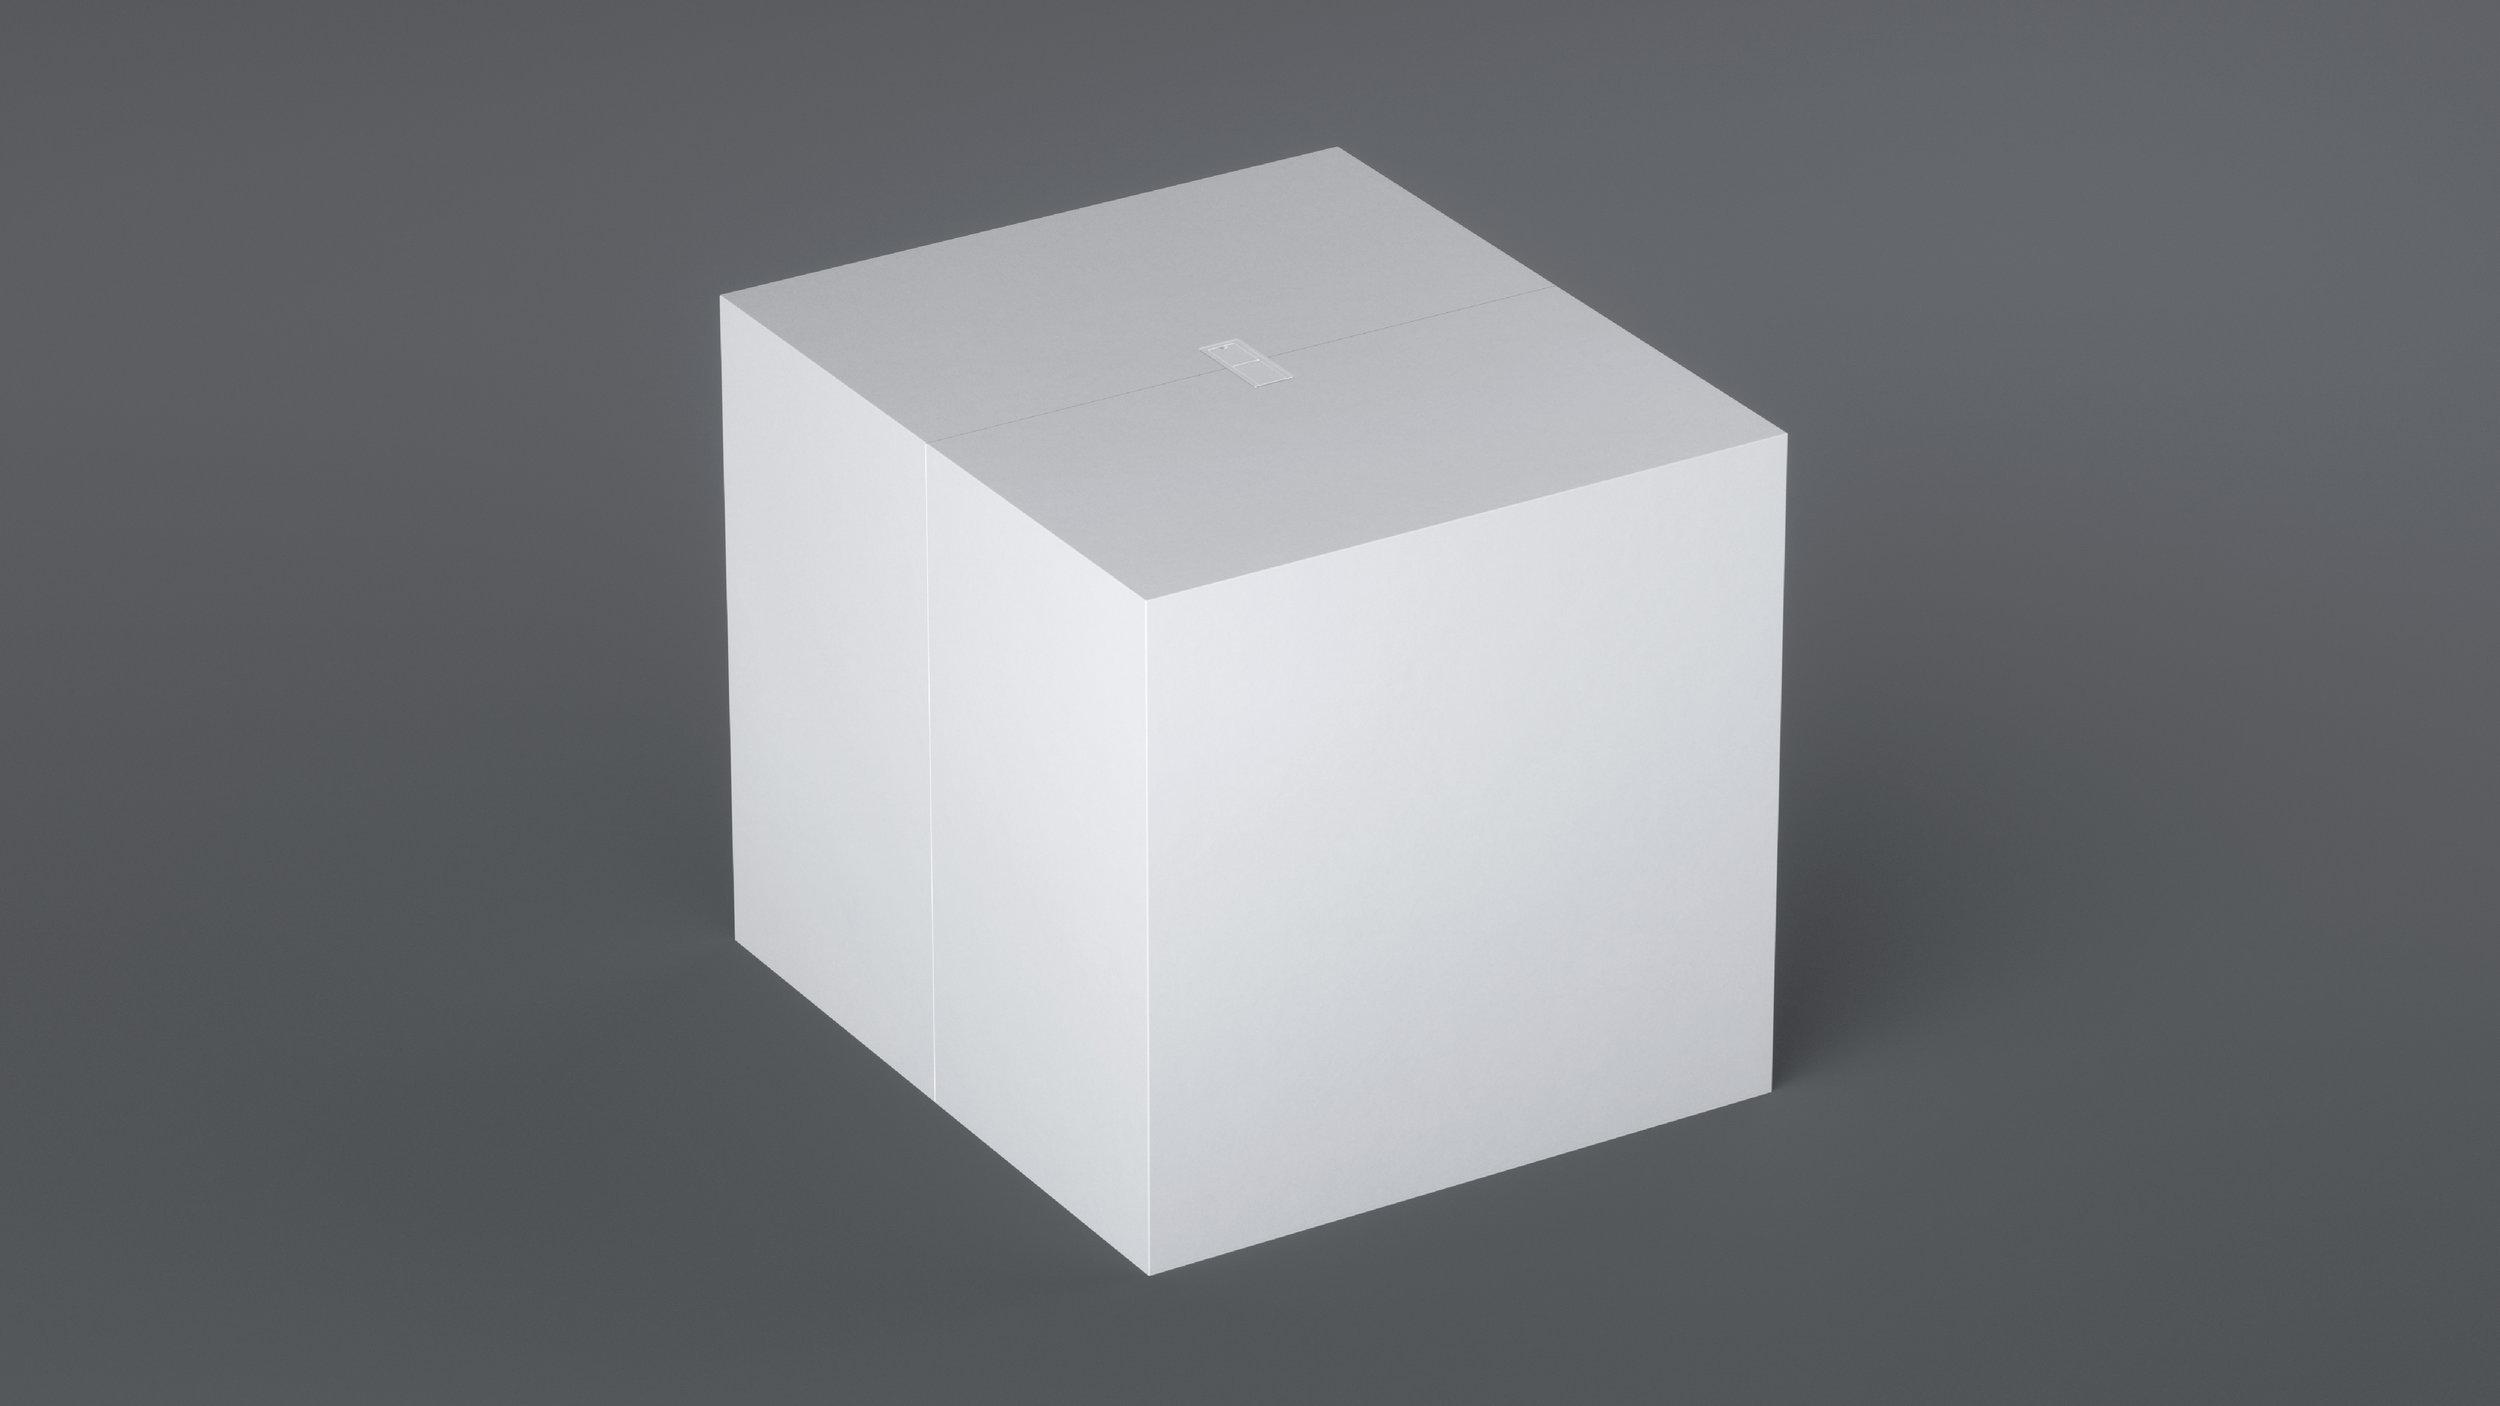 B&W_LibertySuite_PackagingStructure_R148.jpg